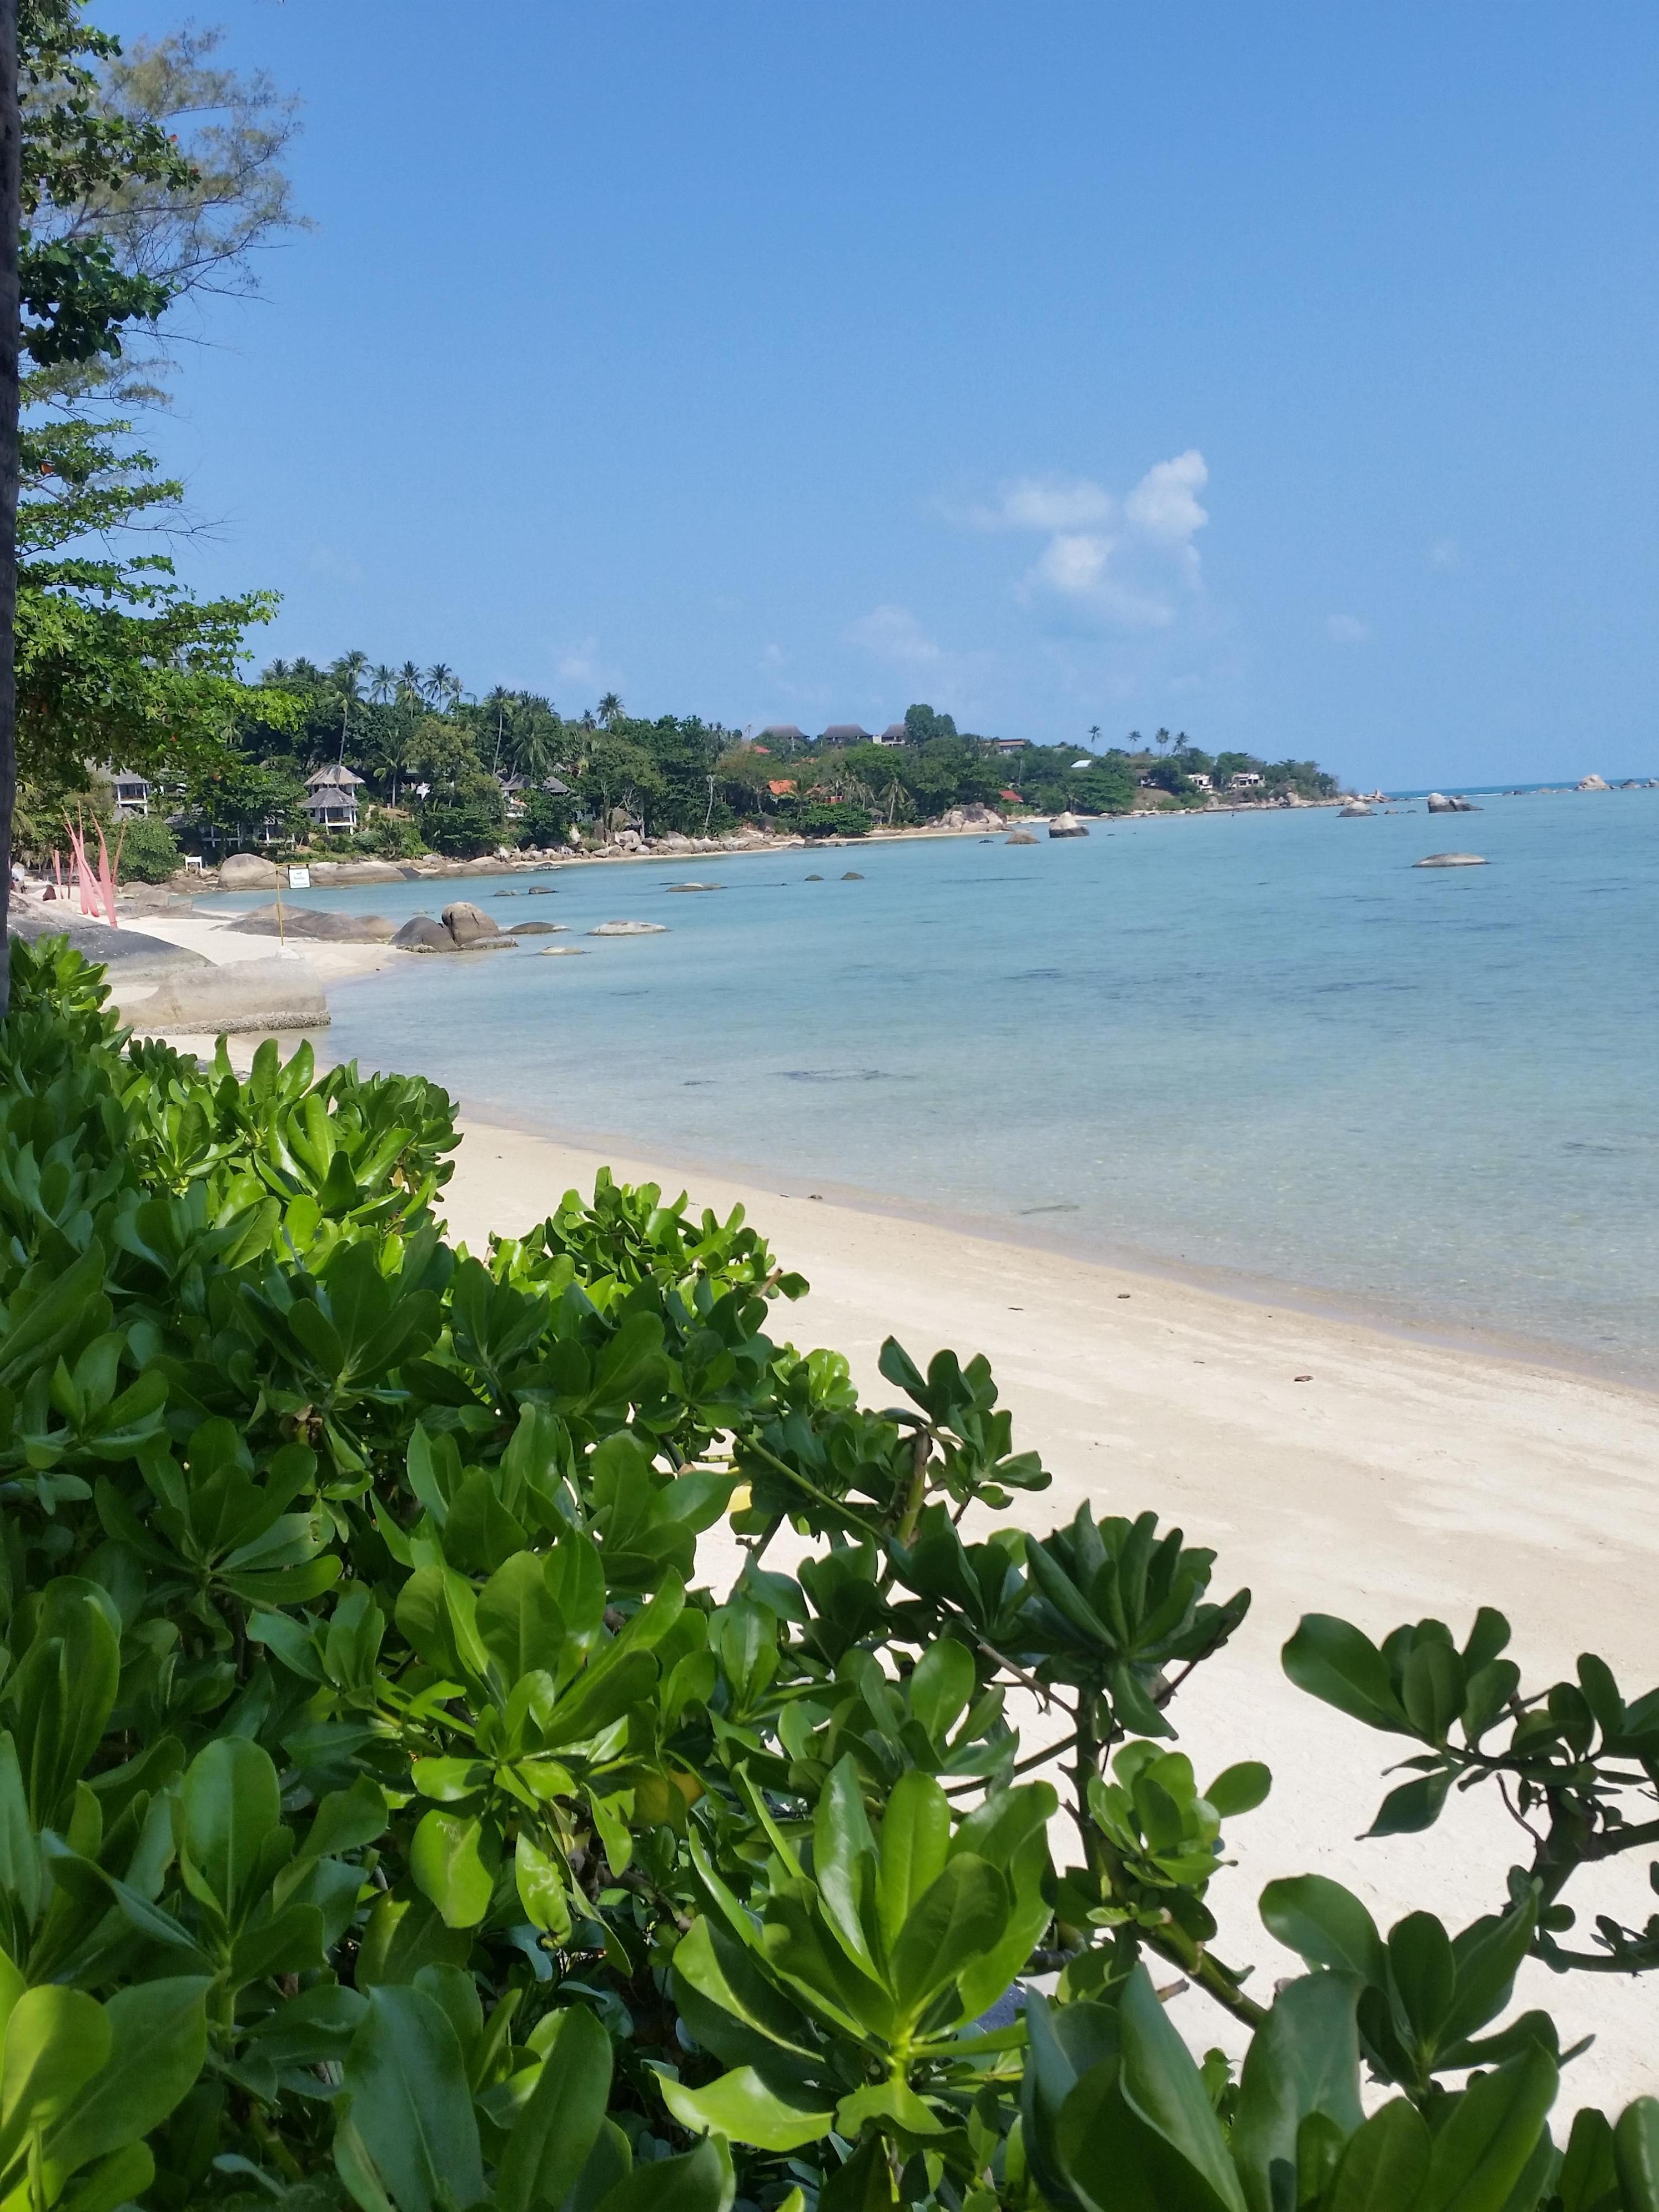 Poolside view of Lamai beach